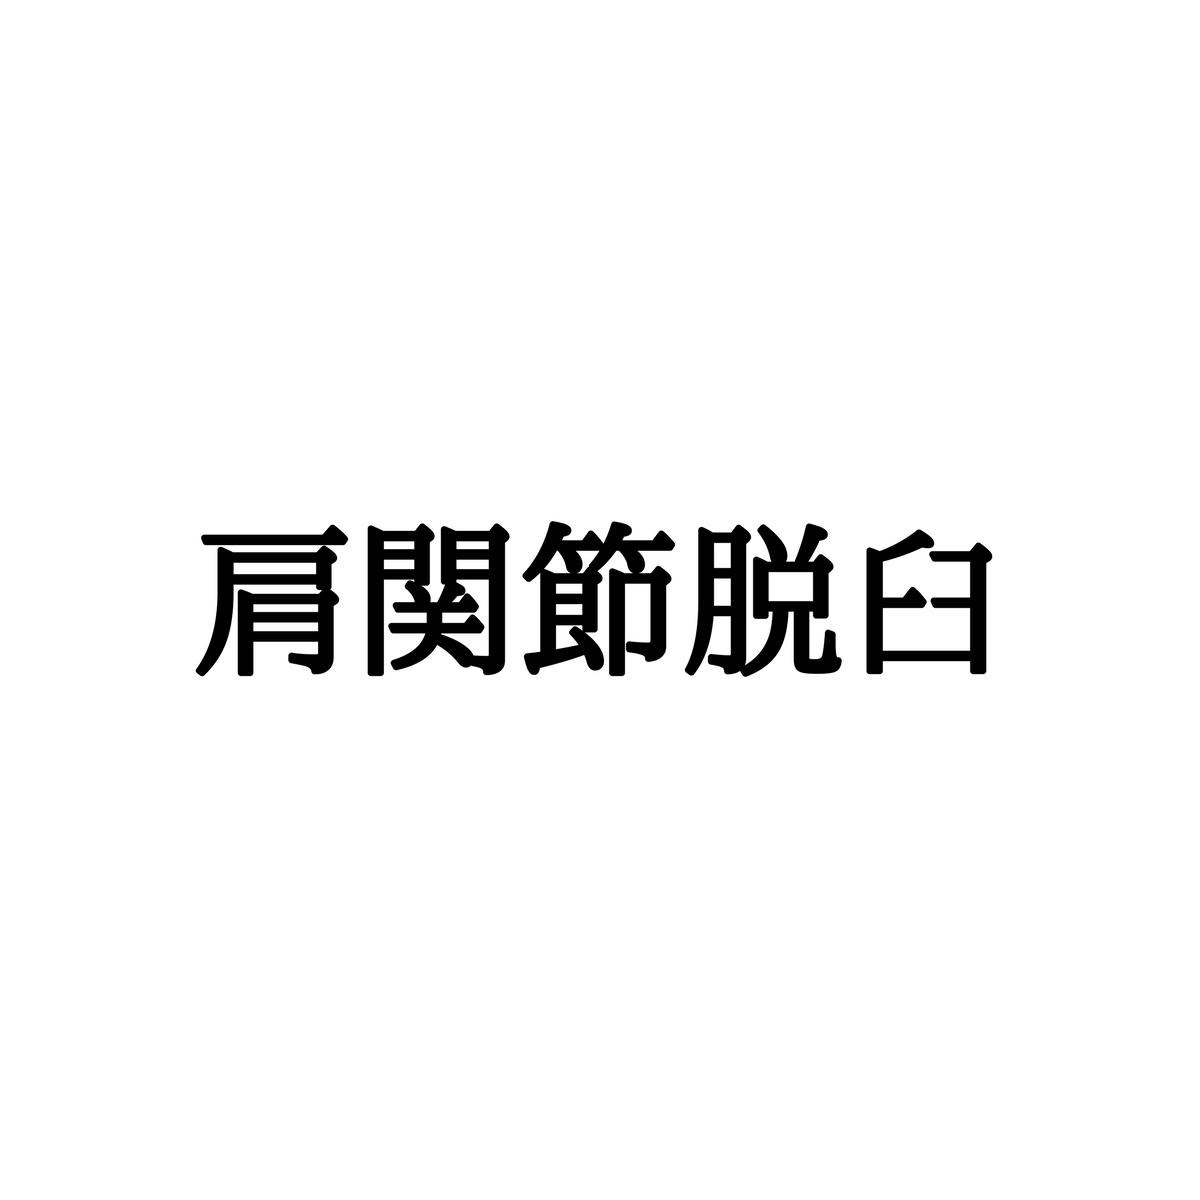 20180203201857